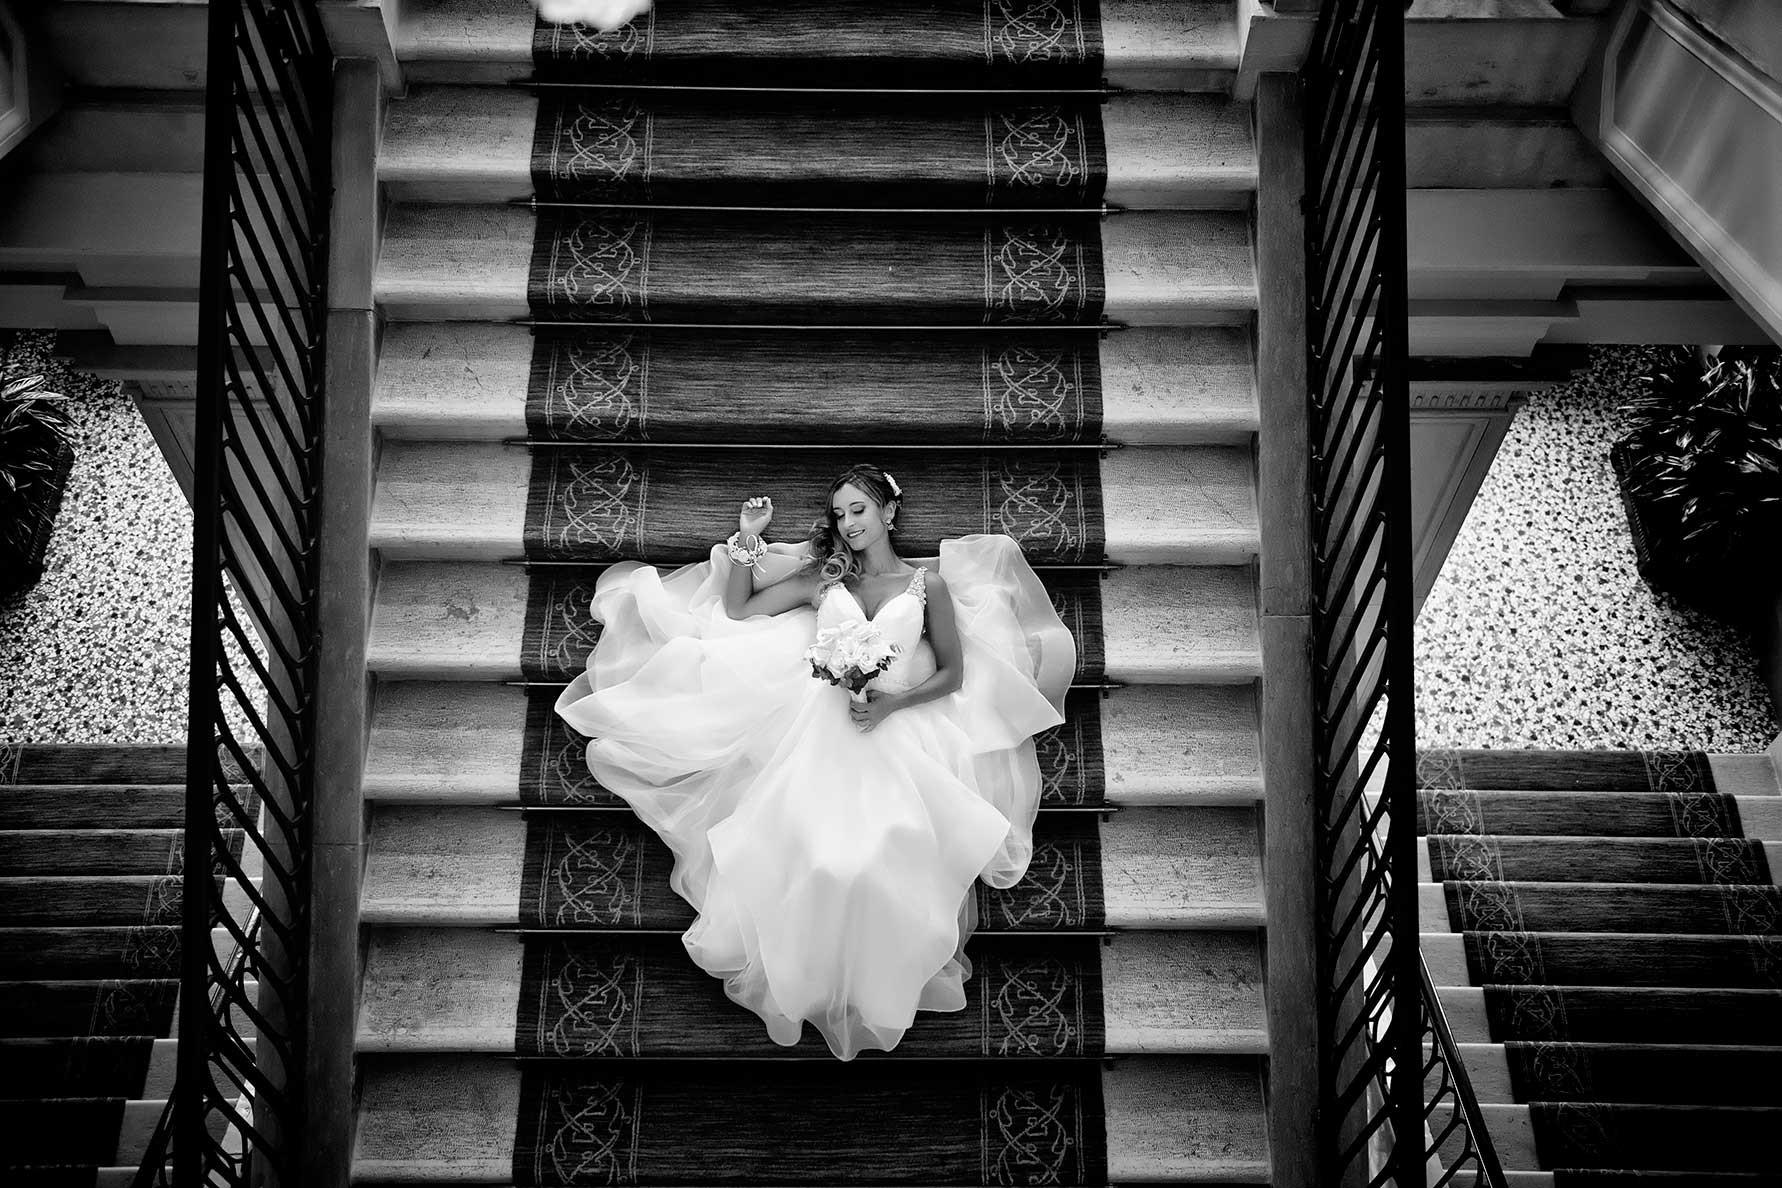 luxury-wedding-photographer-venice (28).